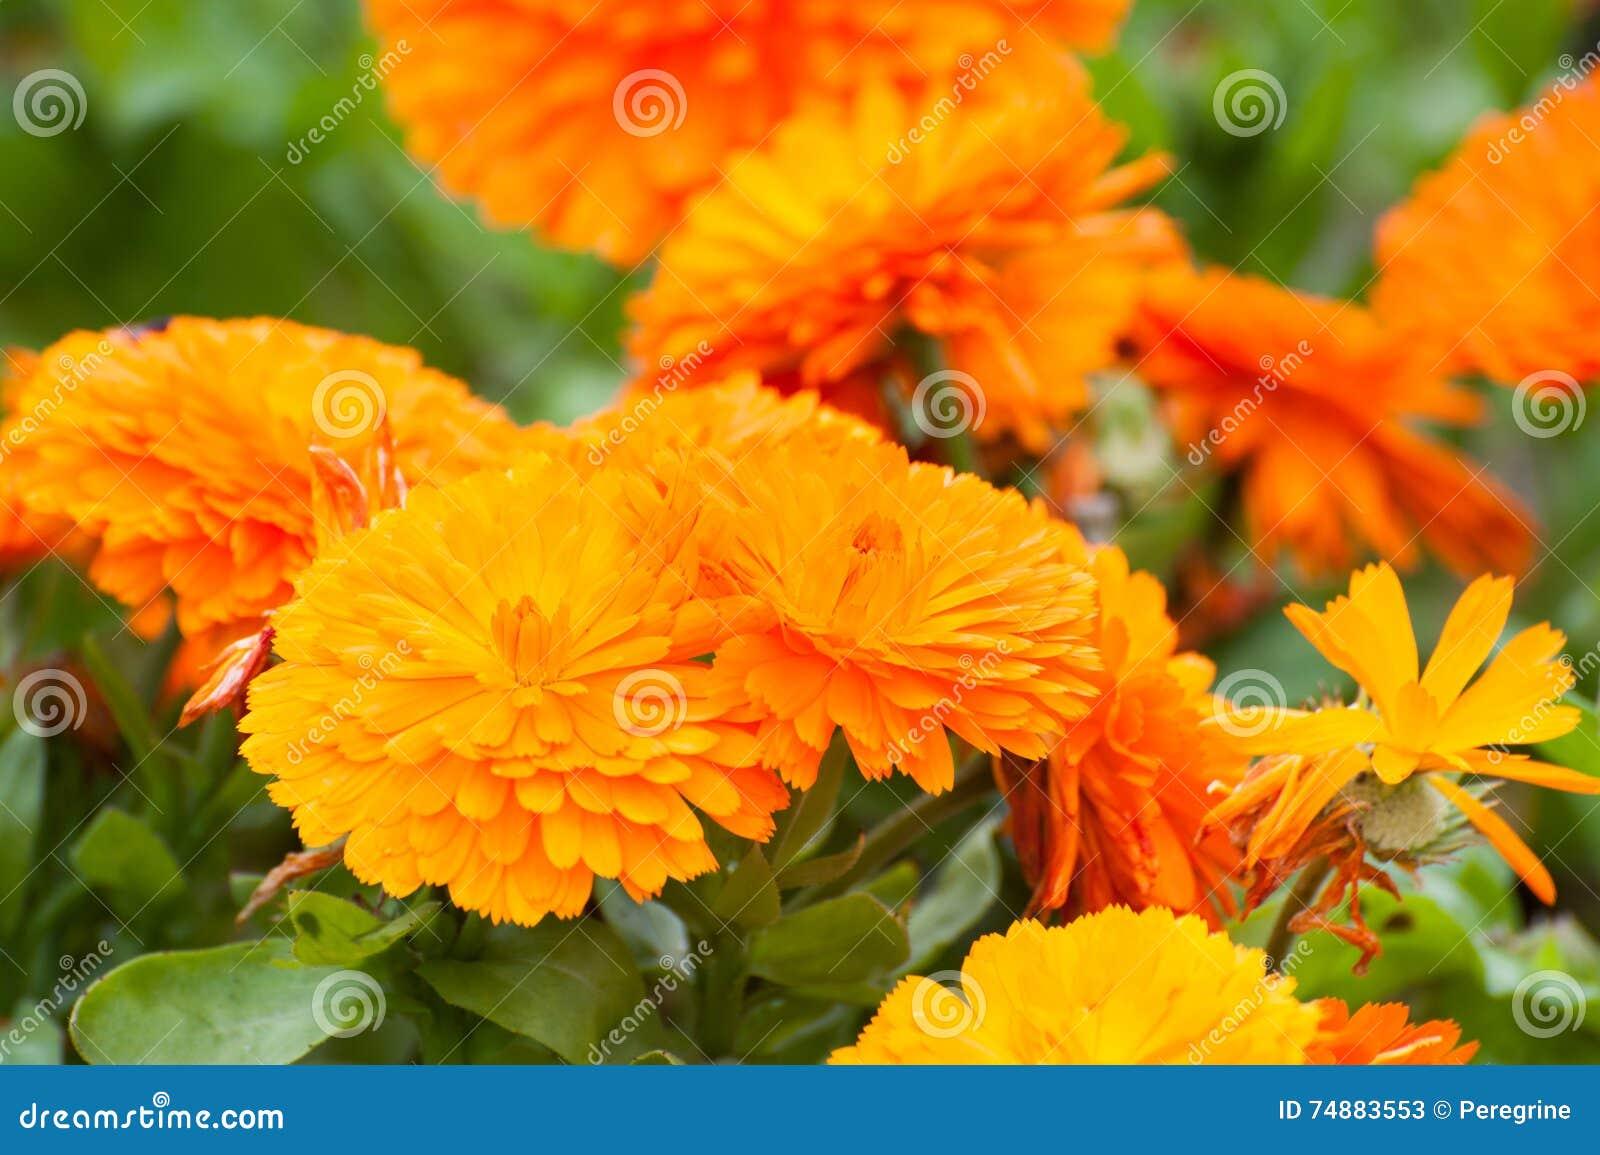 Orange Marigold Flowers (tagetes)